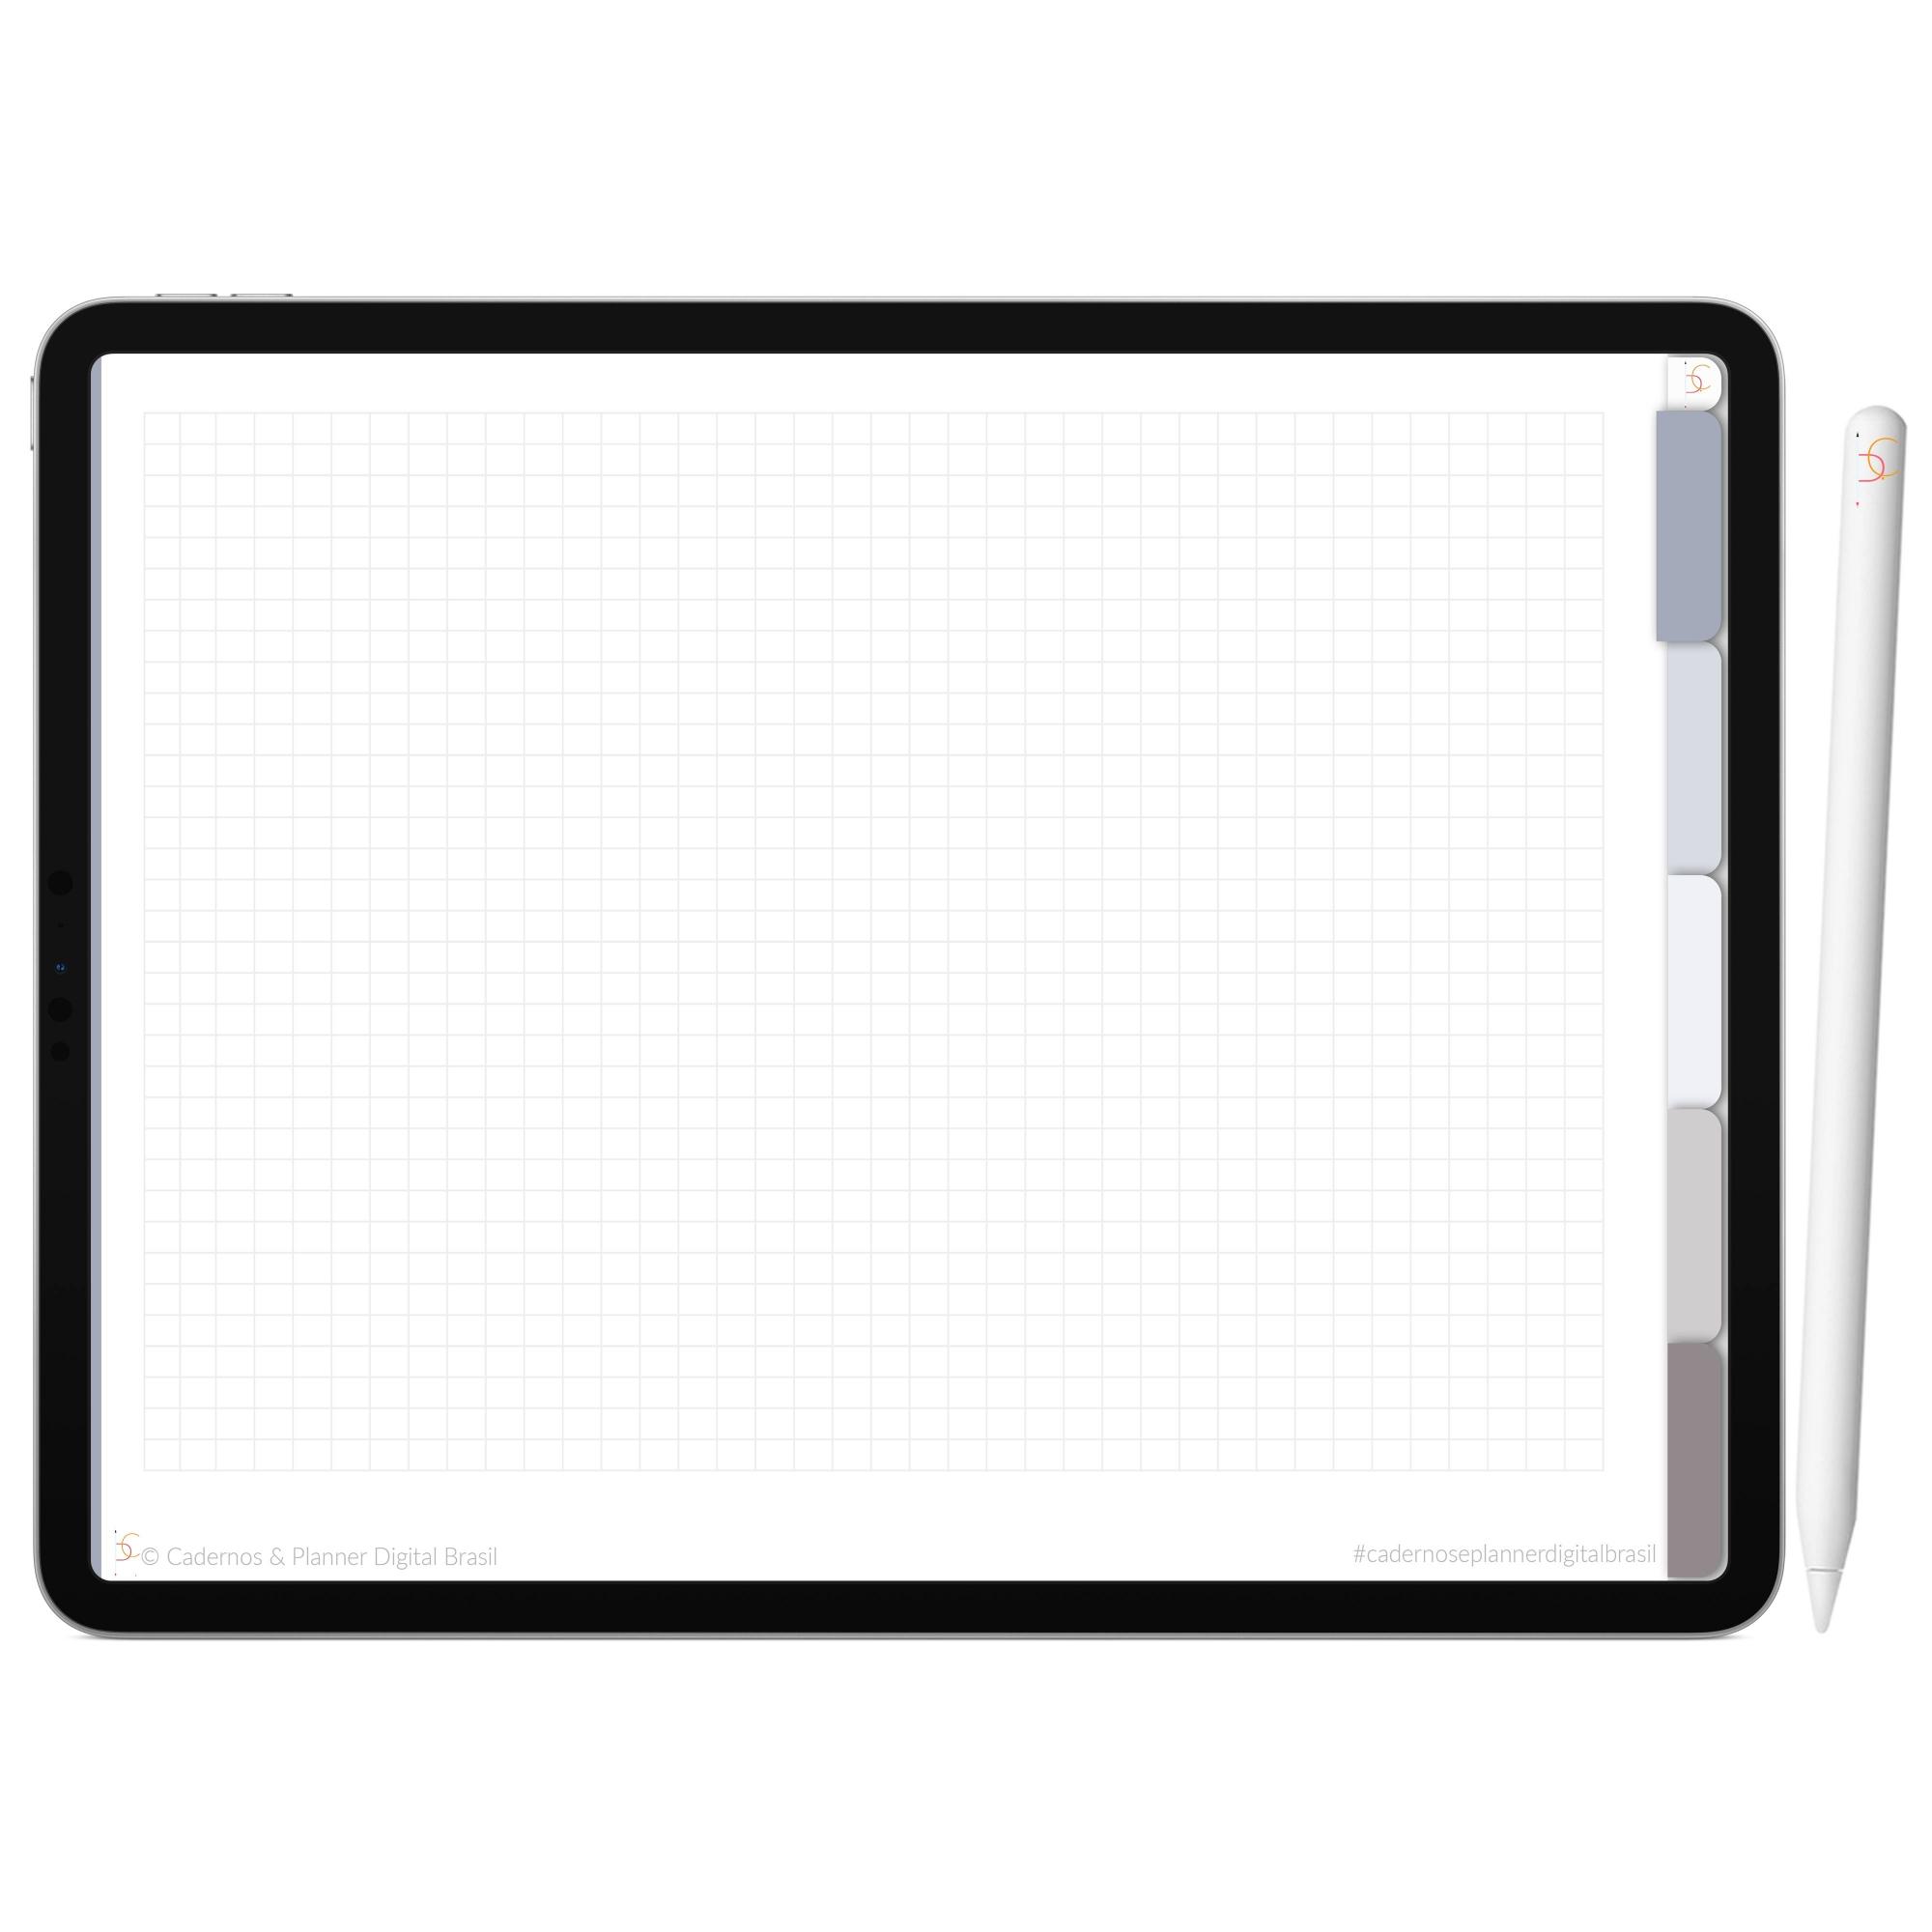 Mapa Mental Digital Cinza Nuvem Céu Noturno | Cinco Matérias Interativo| iPad Tablet | Download Instantâneo